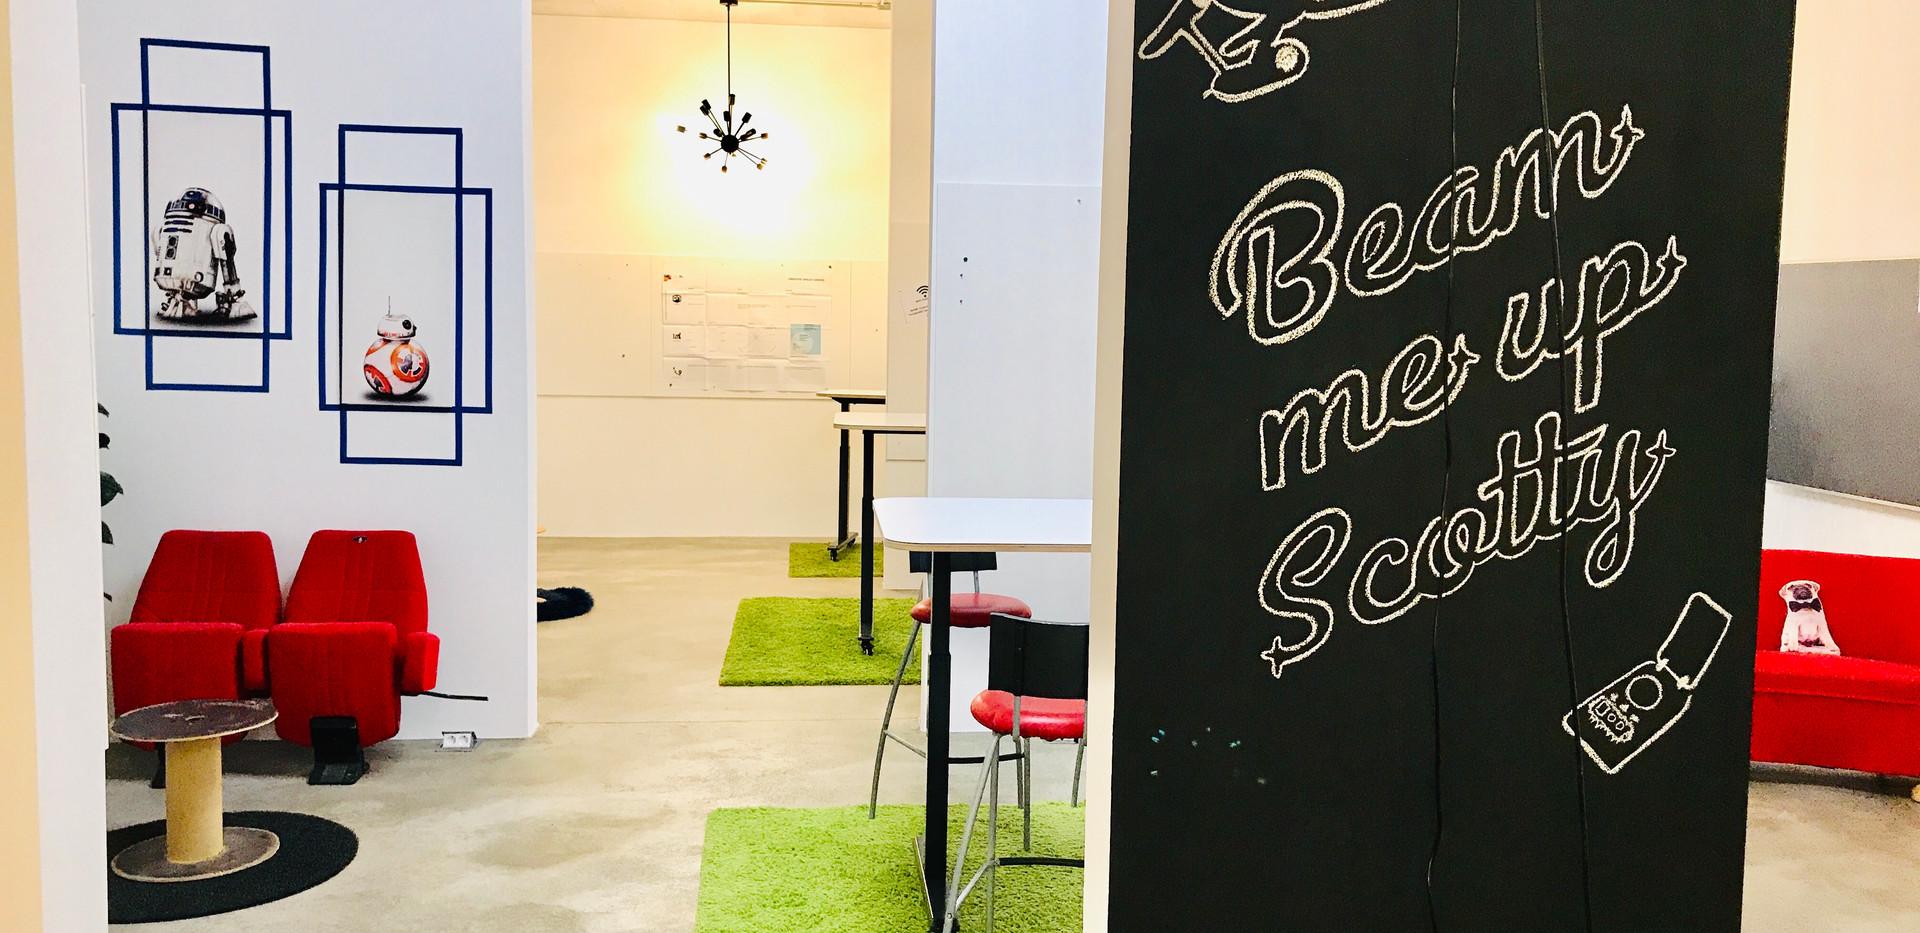 Beaming Area @Coworkingloft